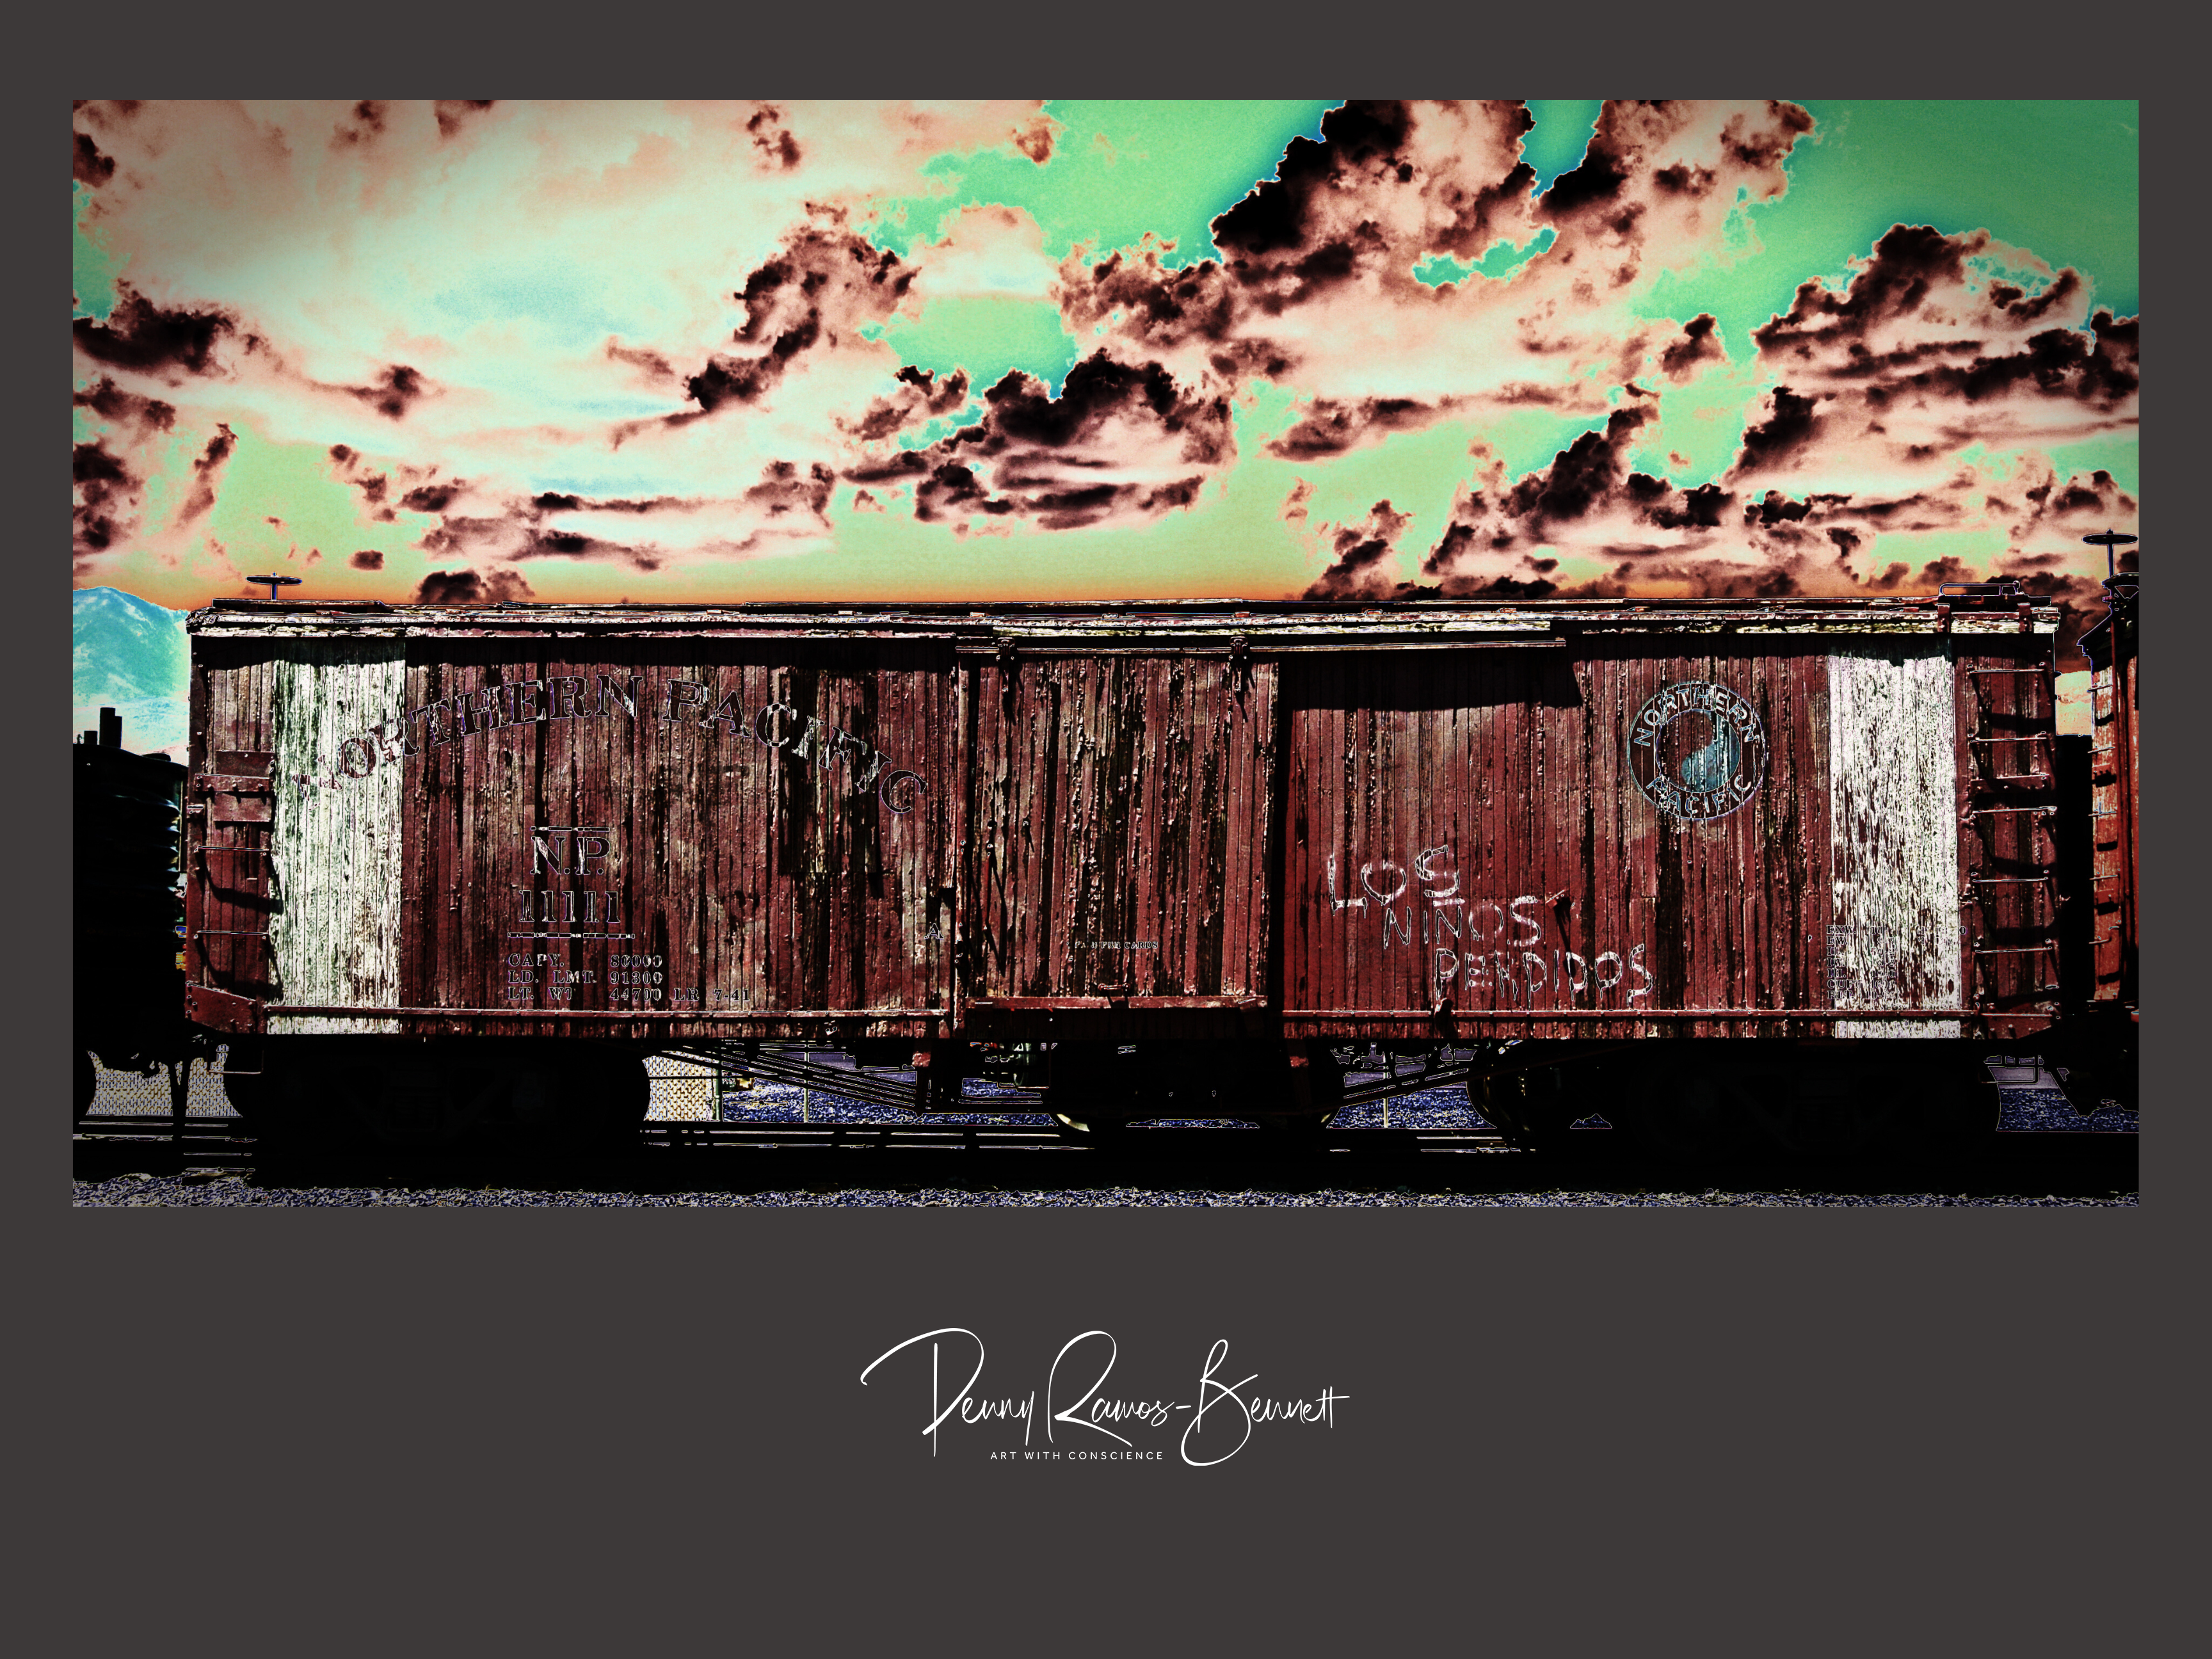 Niños Perdidos written on a rust train car with green background underneath clouds